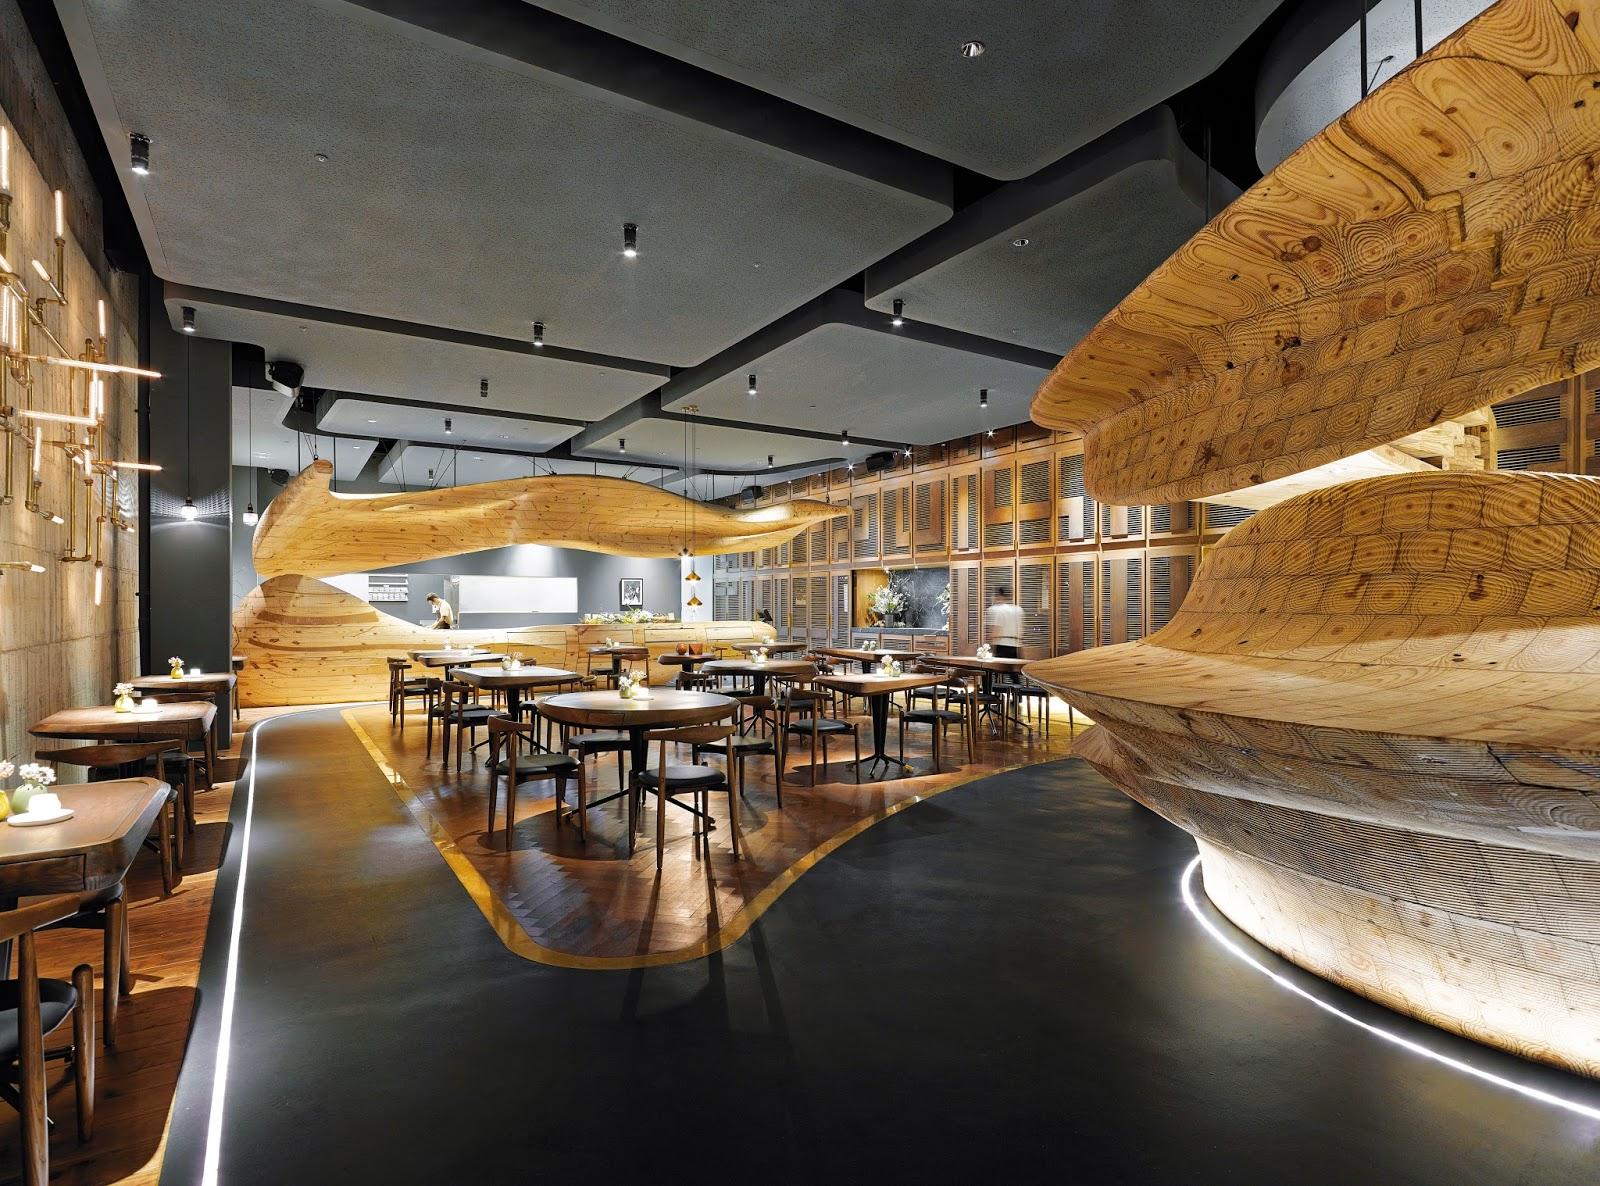 Sanjhes - Proyectos Madera Restaurante